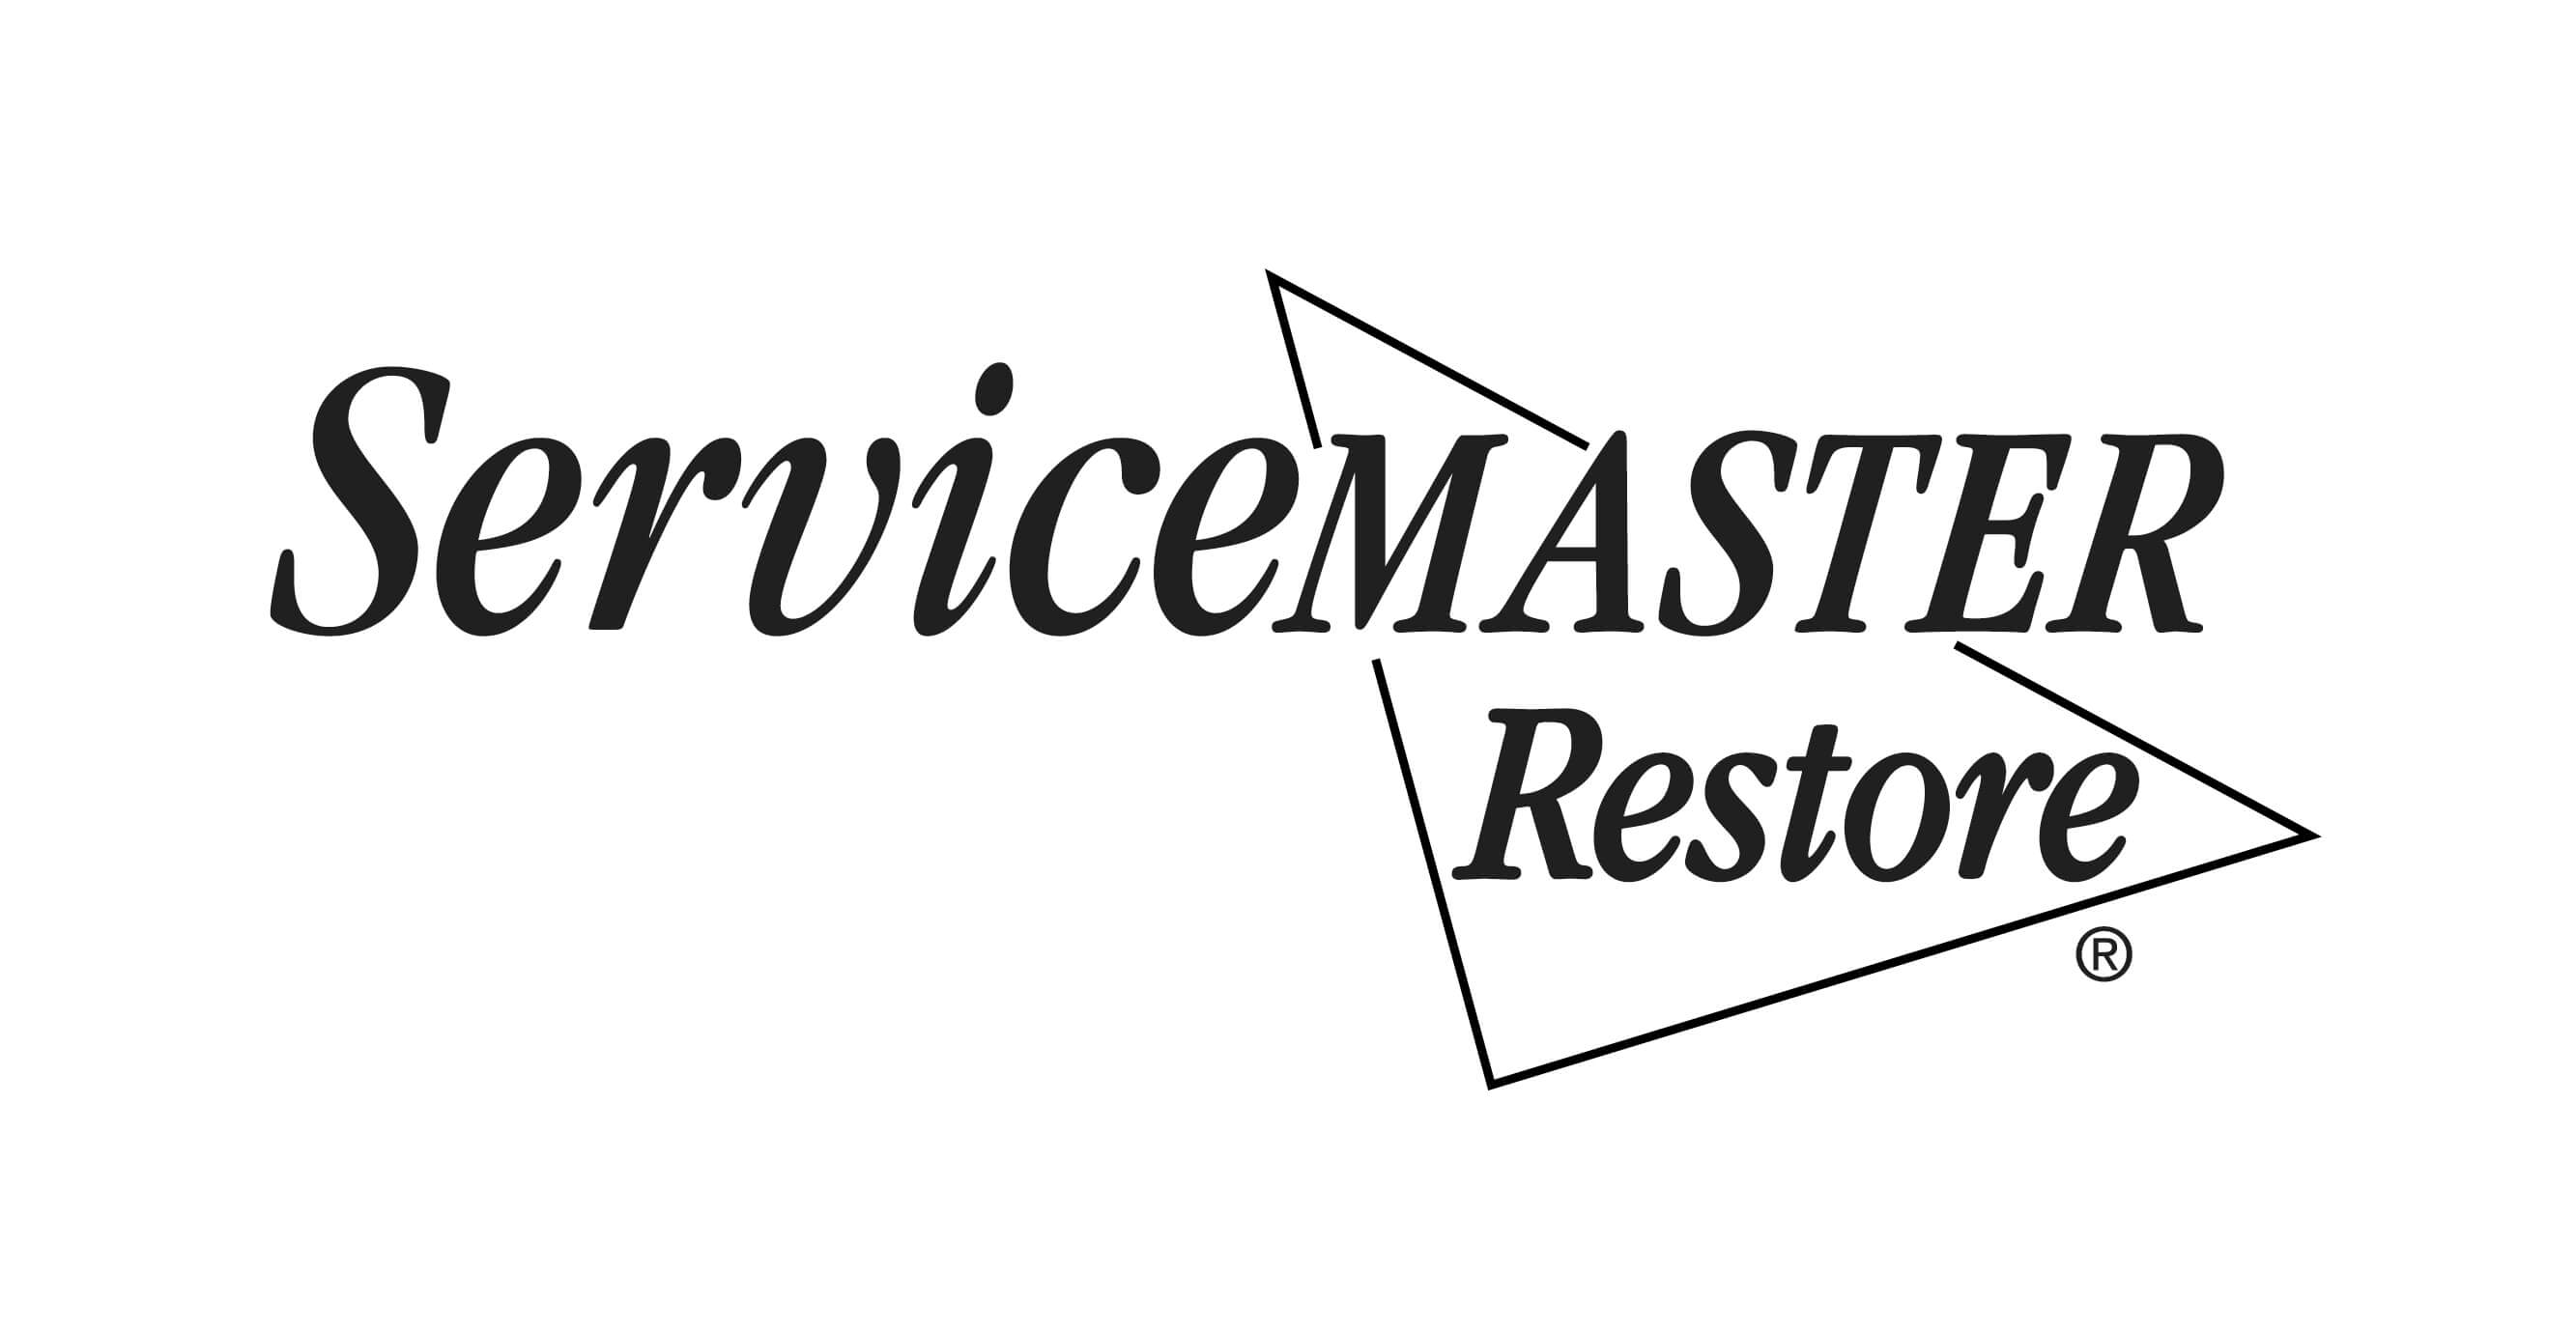 Service Master Restore logo